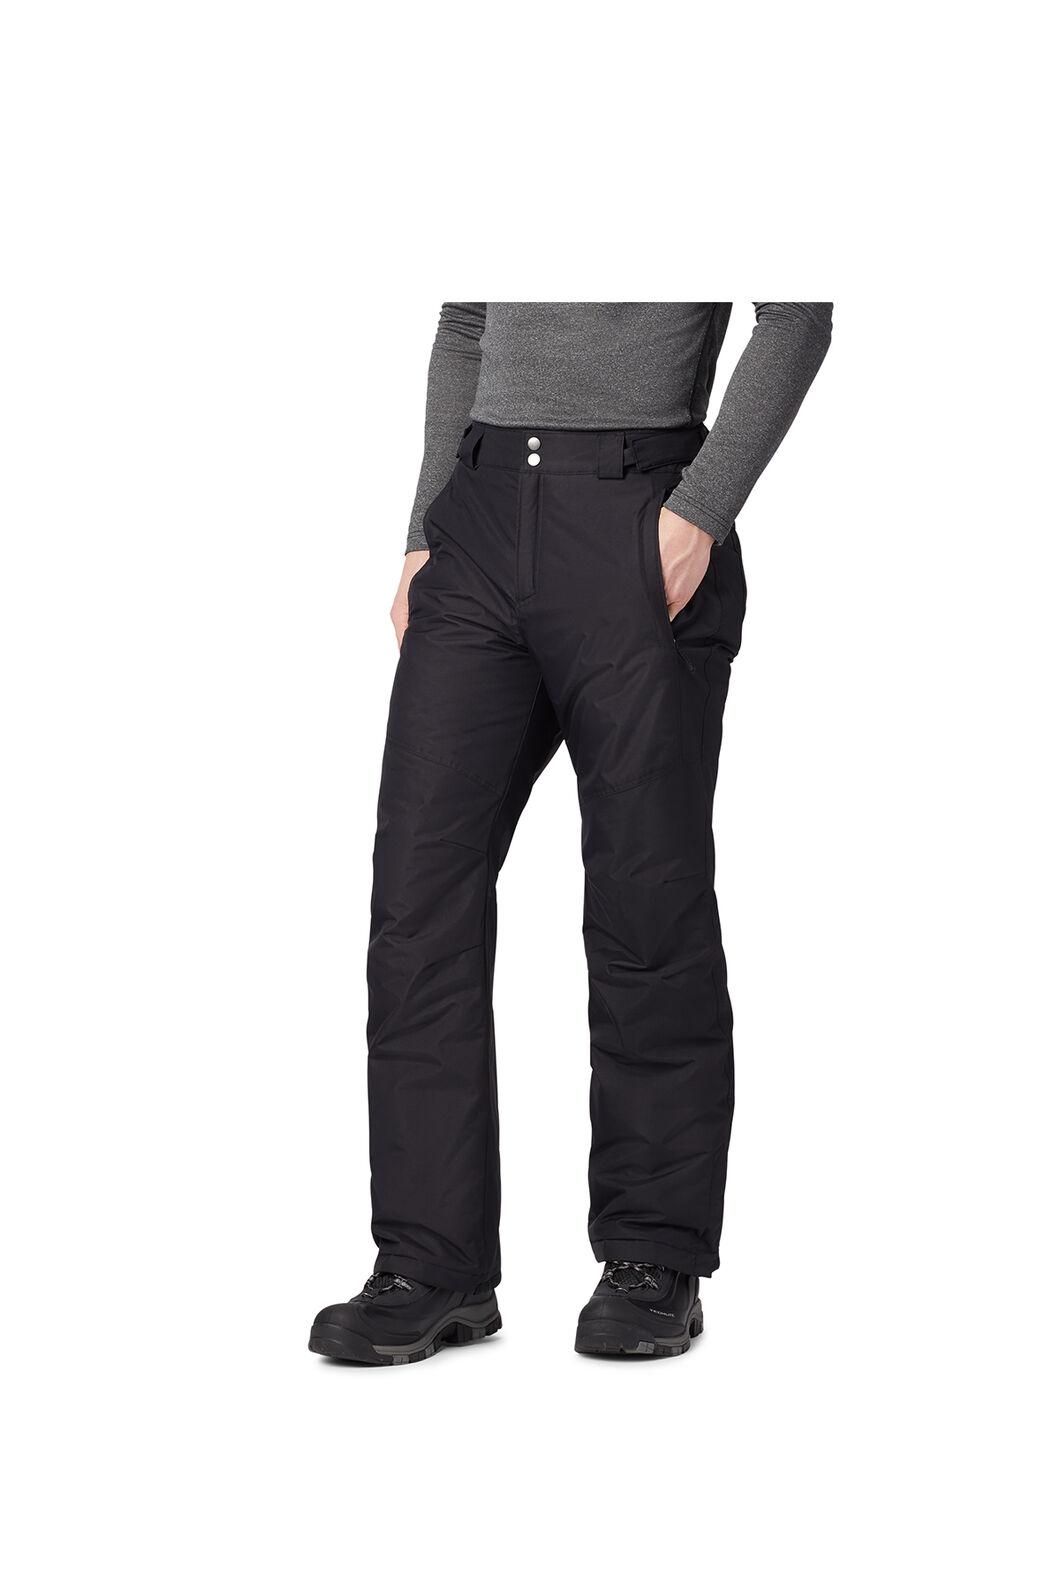 Columbia Bugaboo IV™ Pants — Men's, Black, hi-res